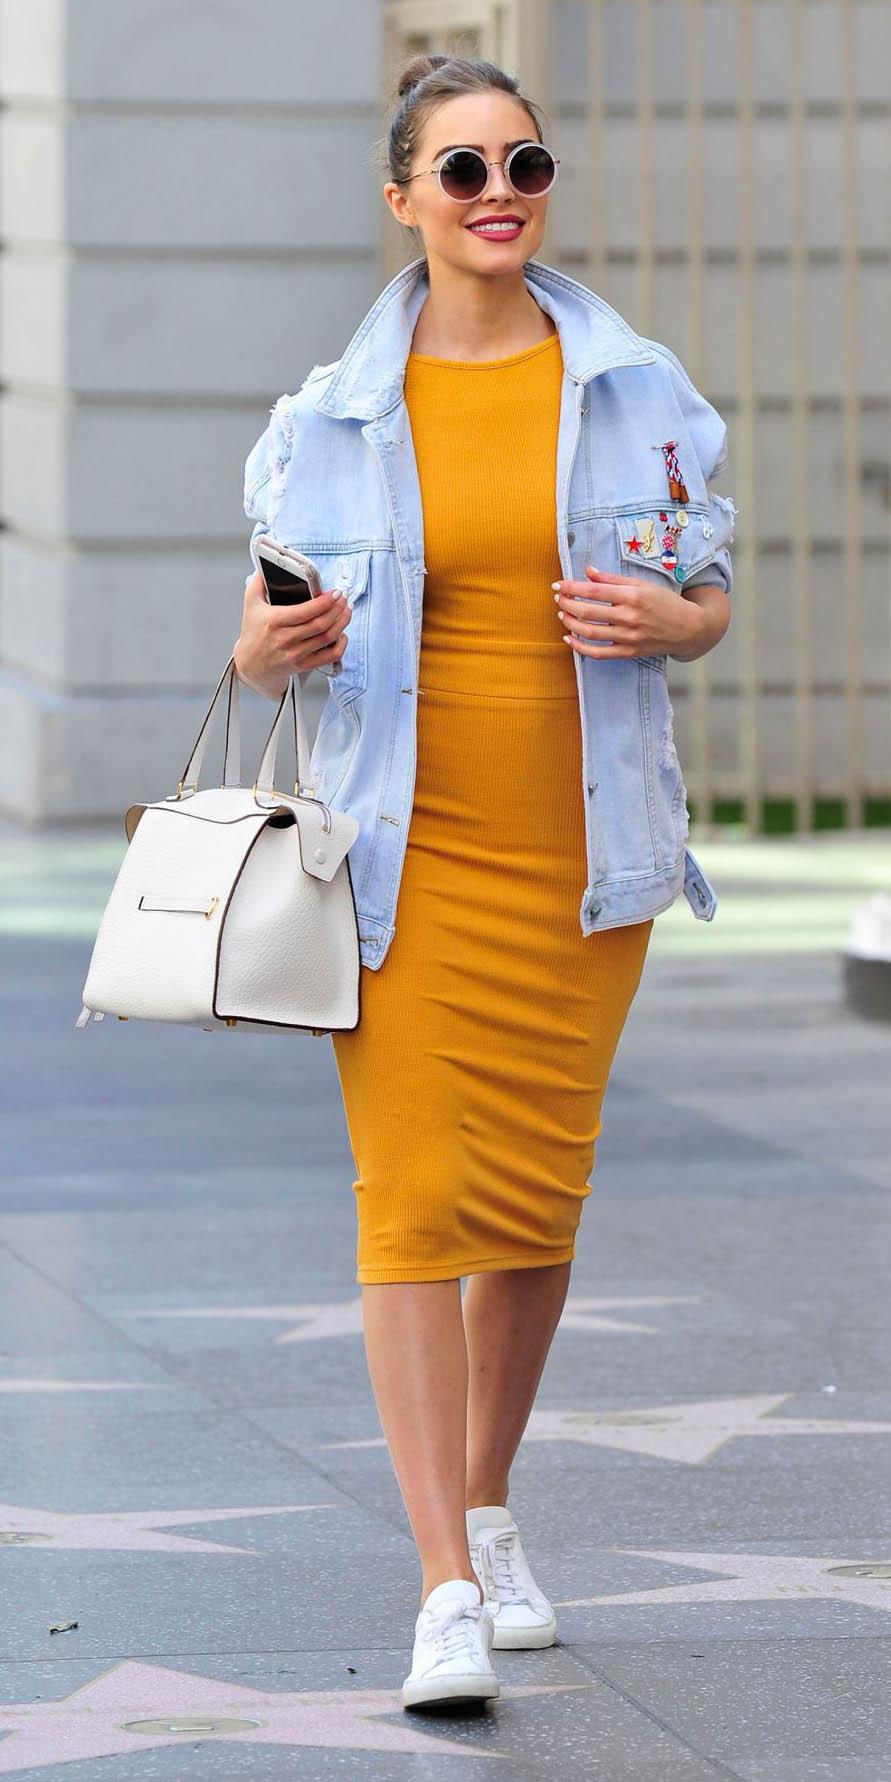 yellow-dress-bodycon-oliviaculpo-blue-light-jacket-jean-white-bag-white-shoe-sneakers-bun-sun-casual-spring-summer-hairr-weekend.jpg